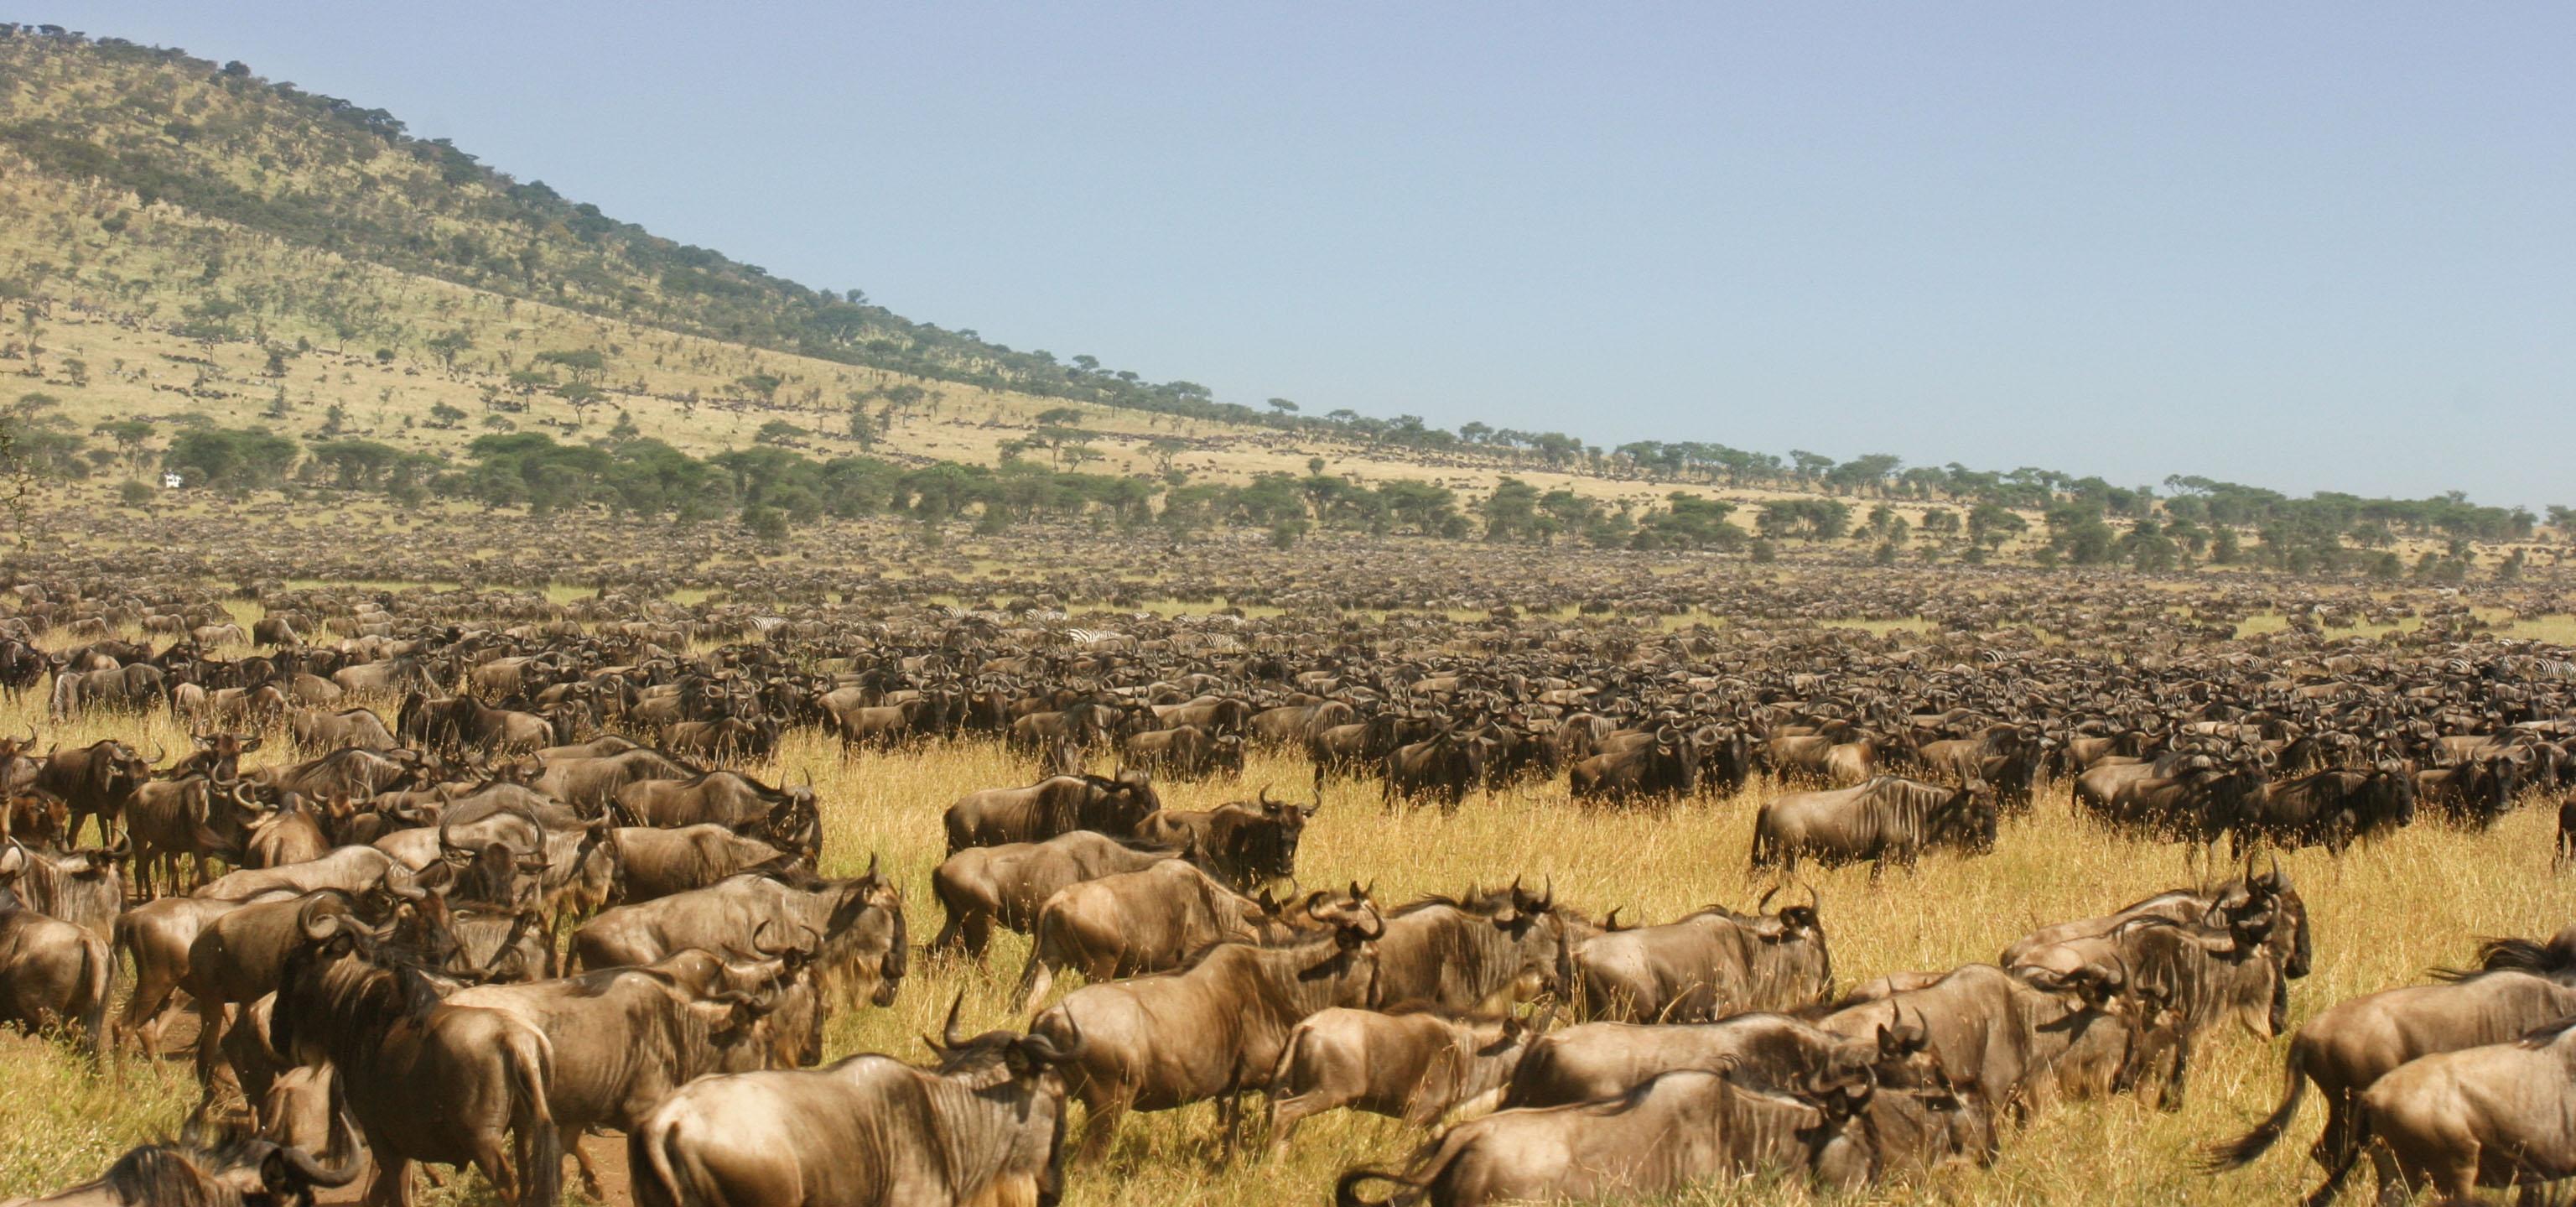 Wildebeest Herd - Piper Mackay Photography: www.pipermackayphotography.com/programs/mountain-gorillas/img_2383